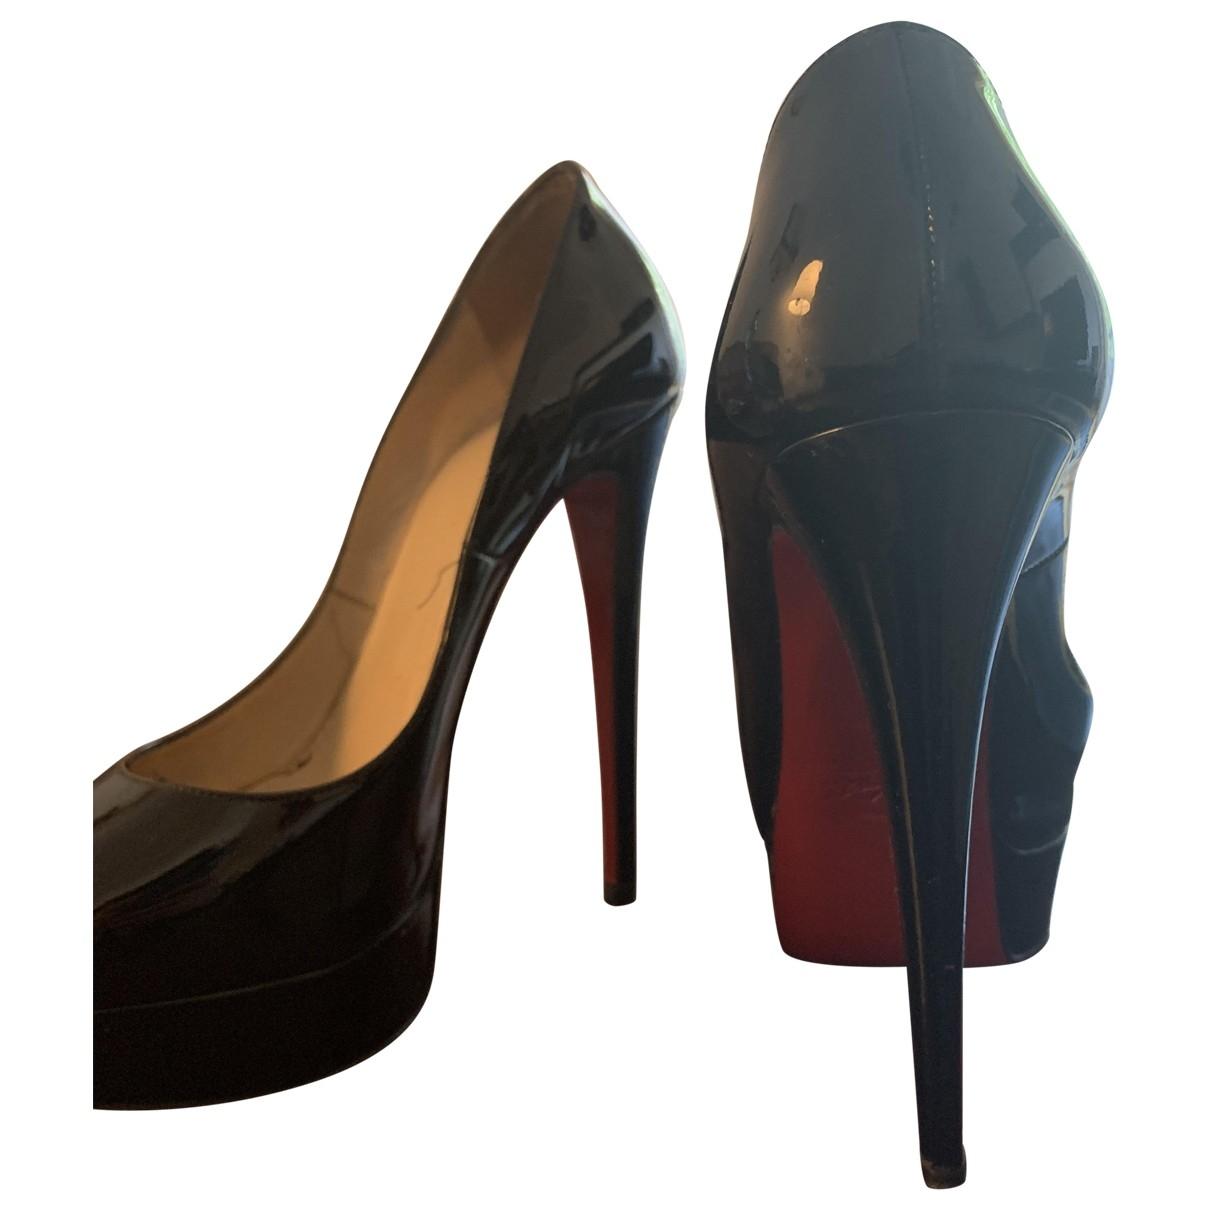 Christian Louboutin Lady Peep Black Patent leather Heels for Women 36.5 EU